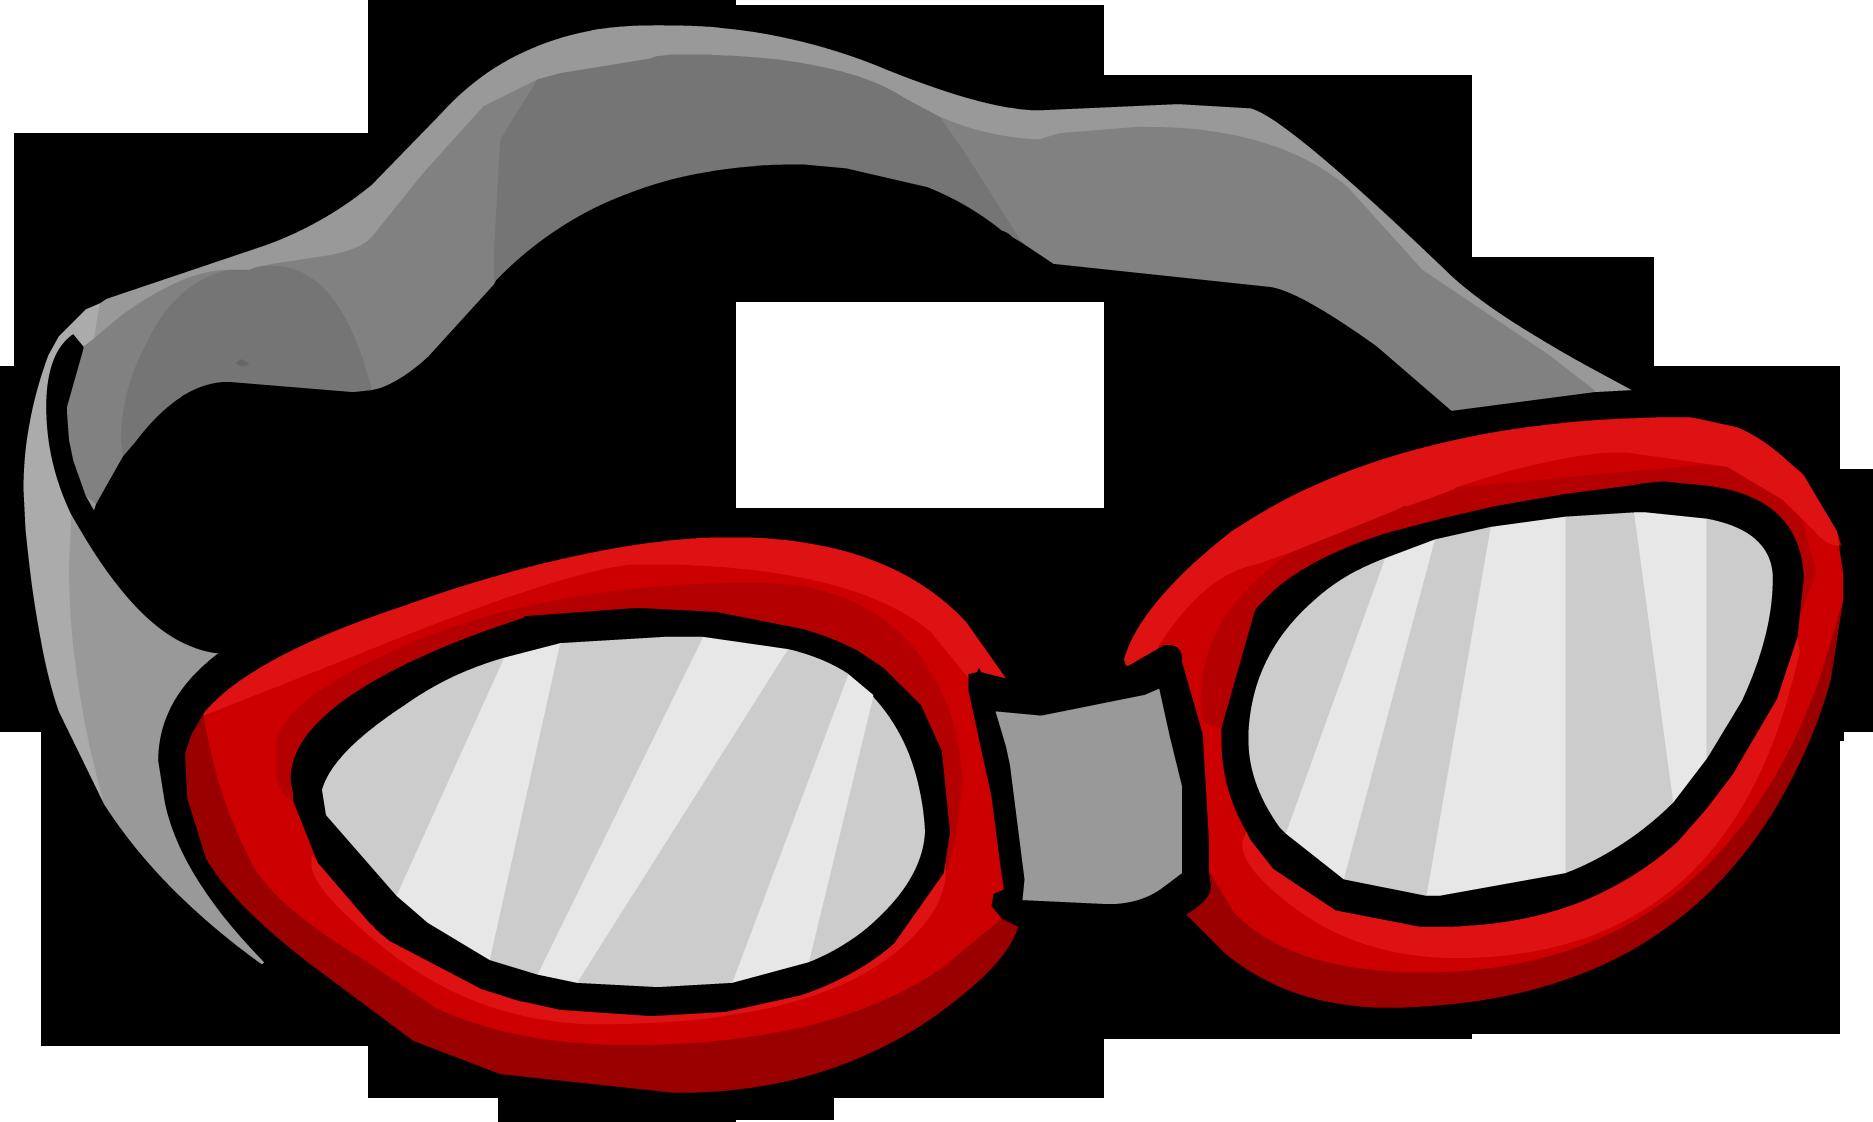 Goggles clipart #10